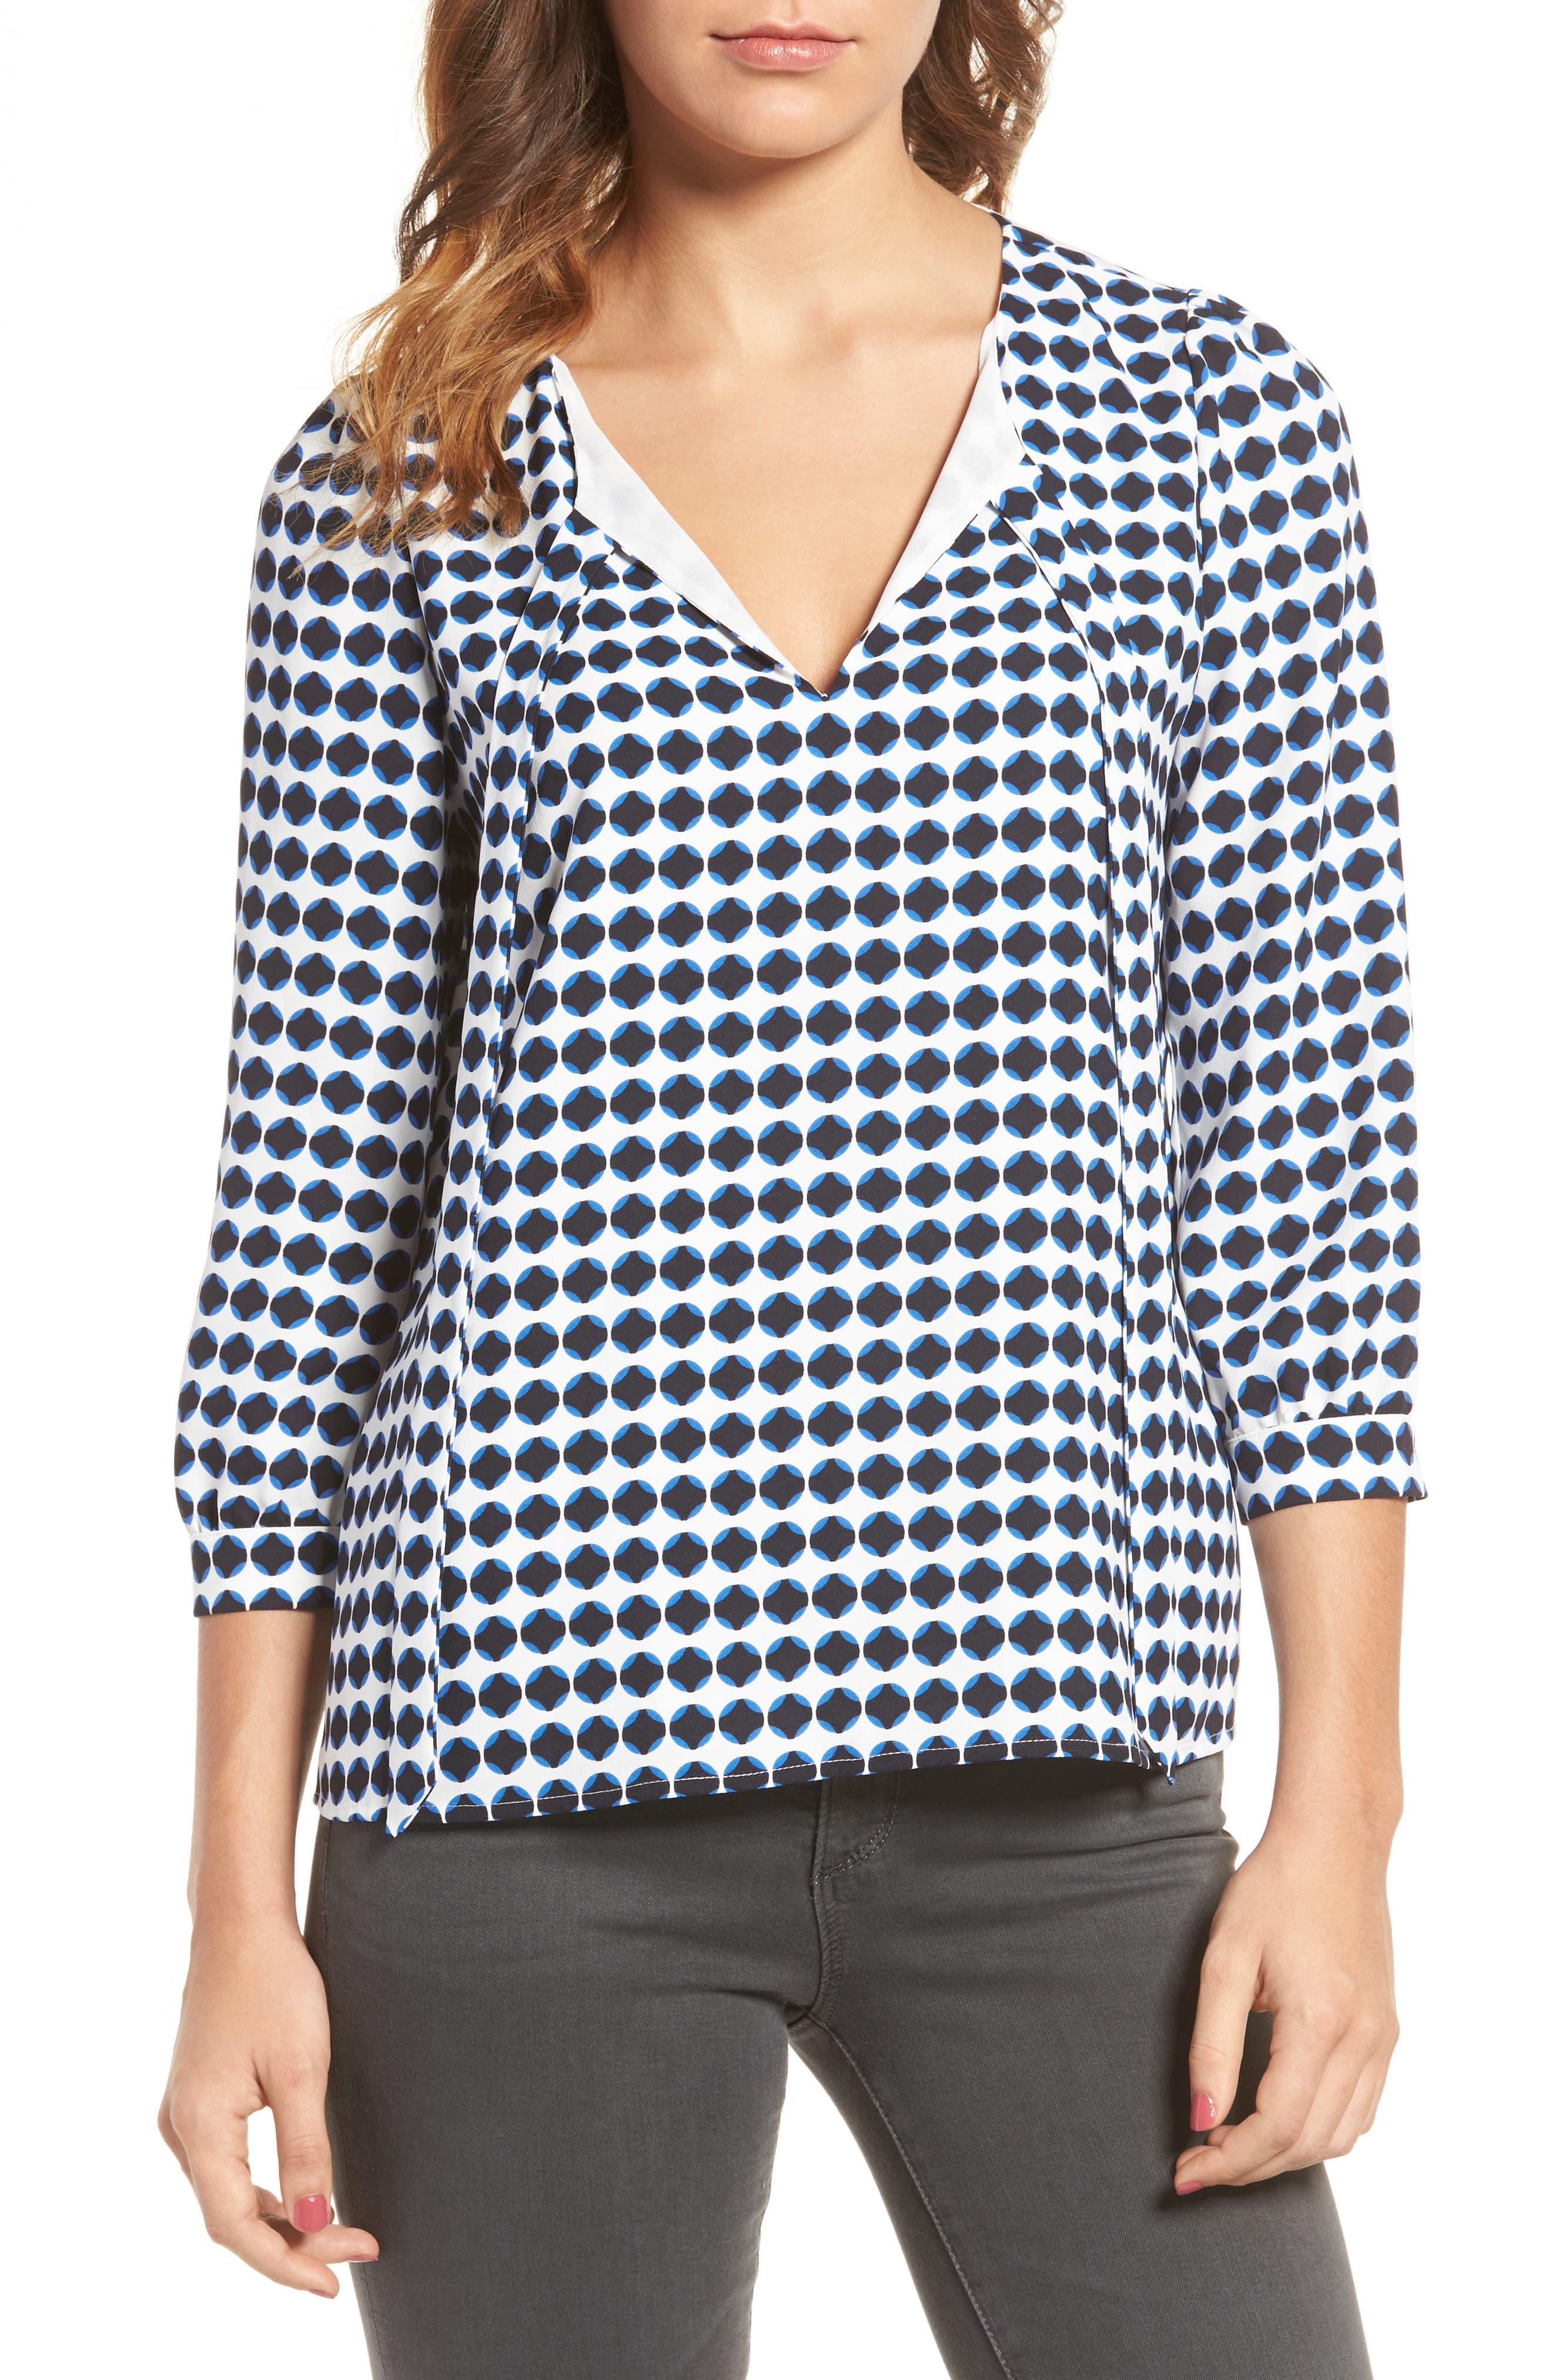 Main Image - cooper & ella Valentine Tie Front Blouse